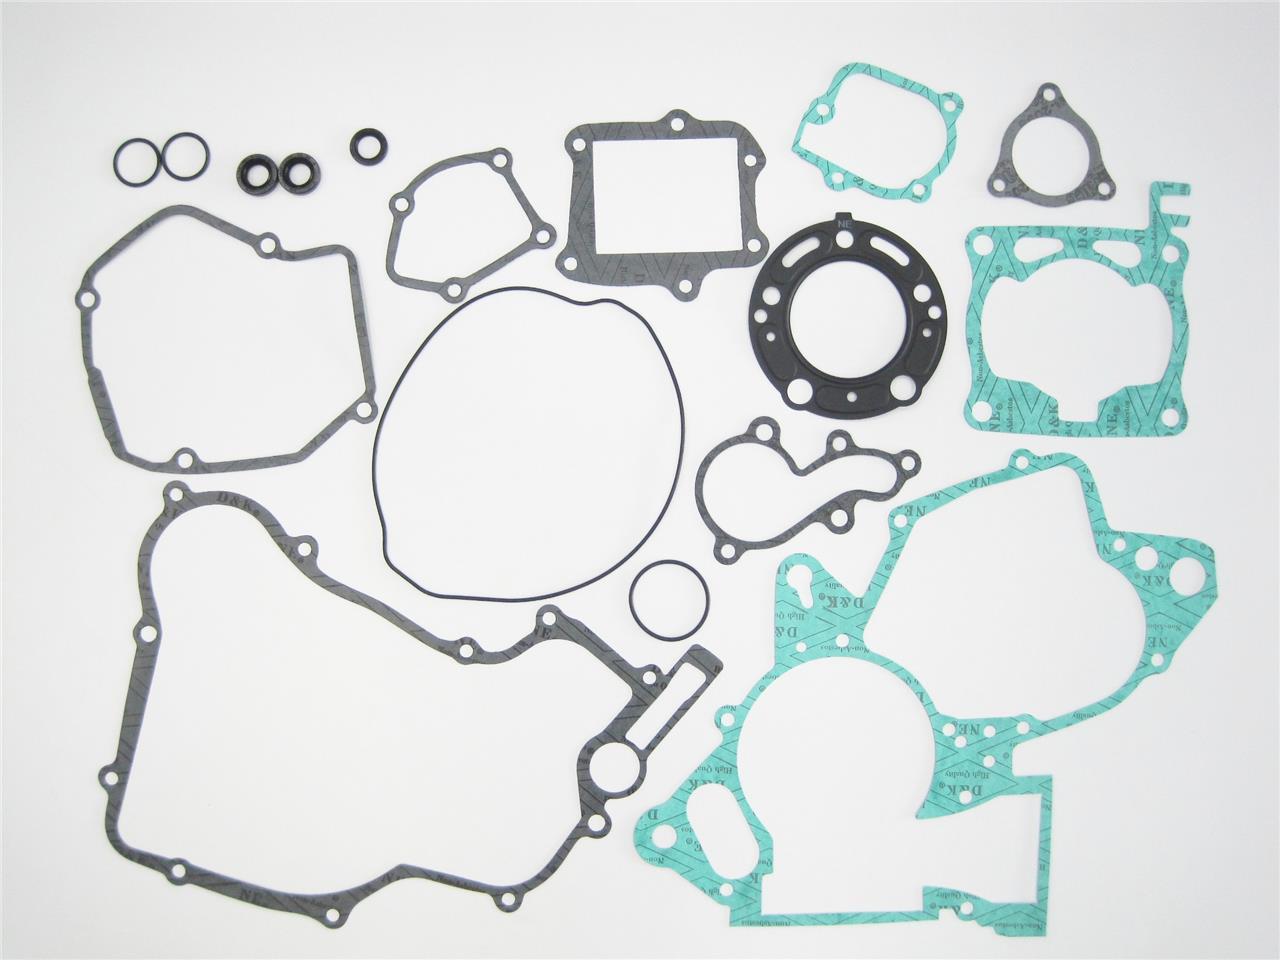 Motorcycle Parts Accessories From Japan Webike Honda Cr125r Engine Wiring Diagram Tecnium Complete Gasket Set